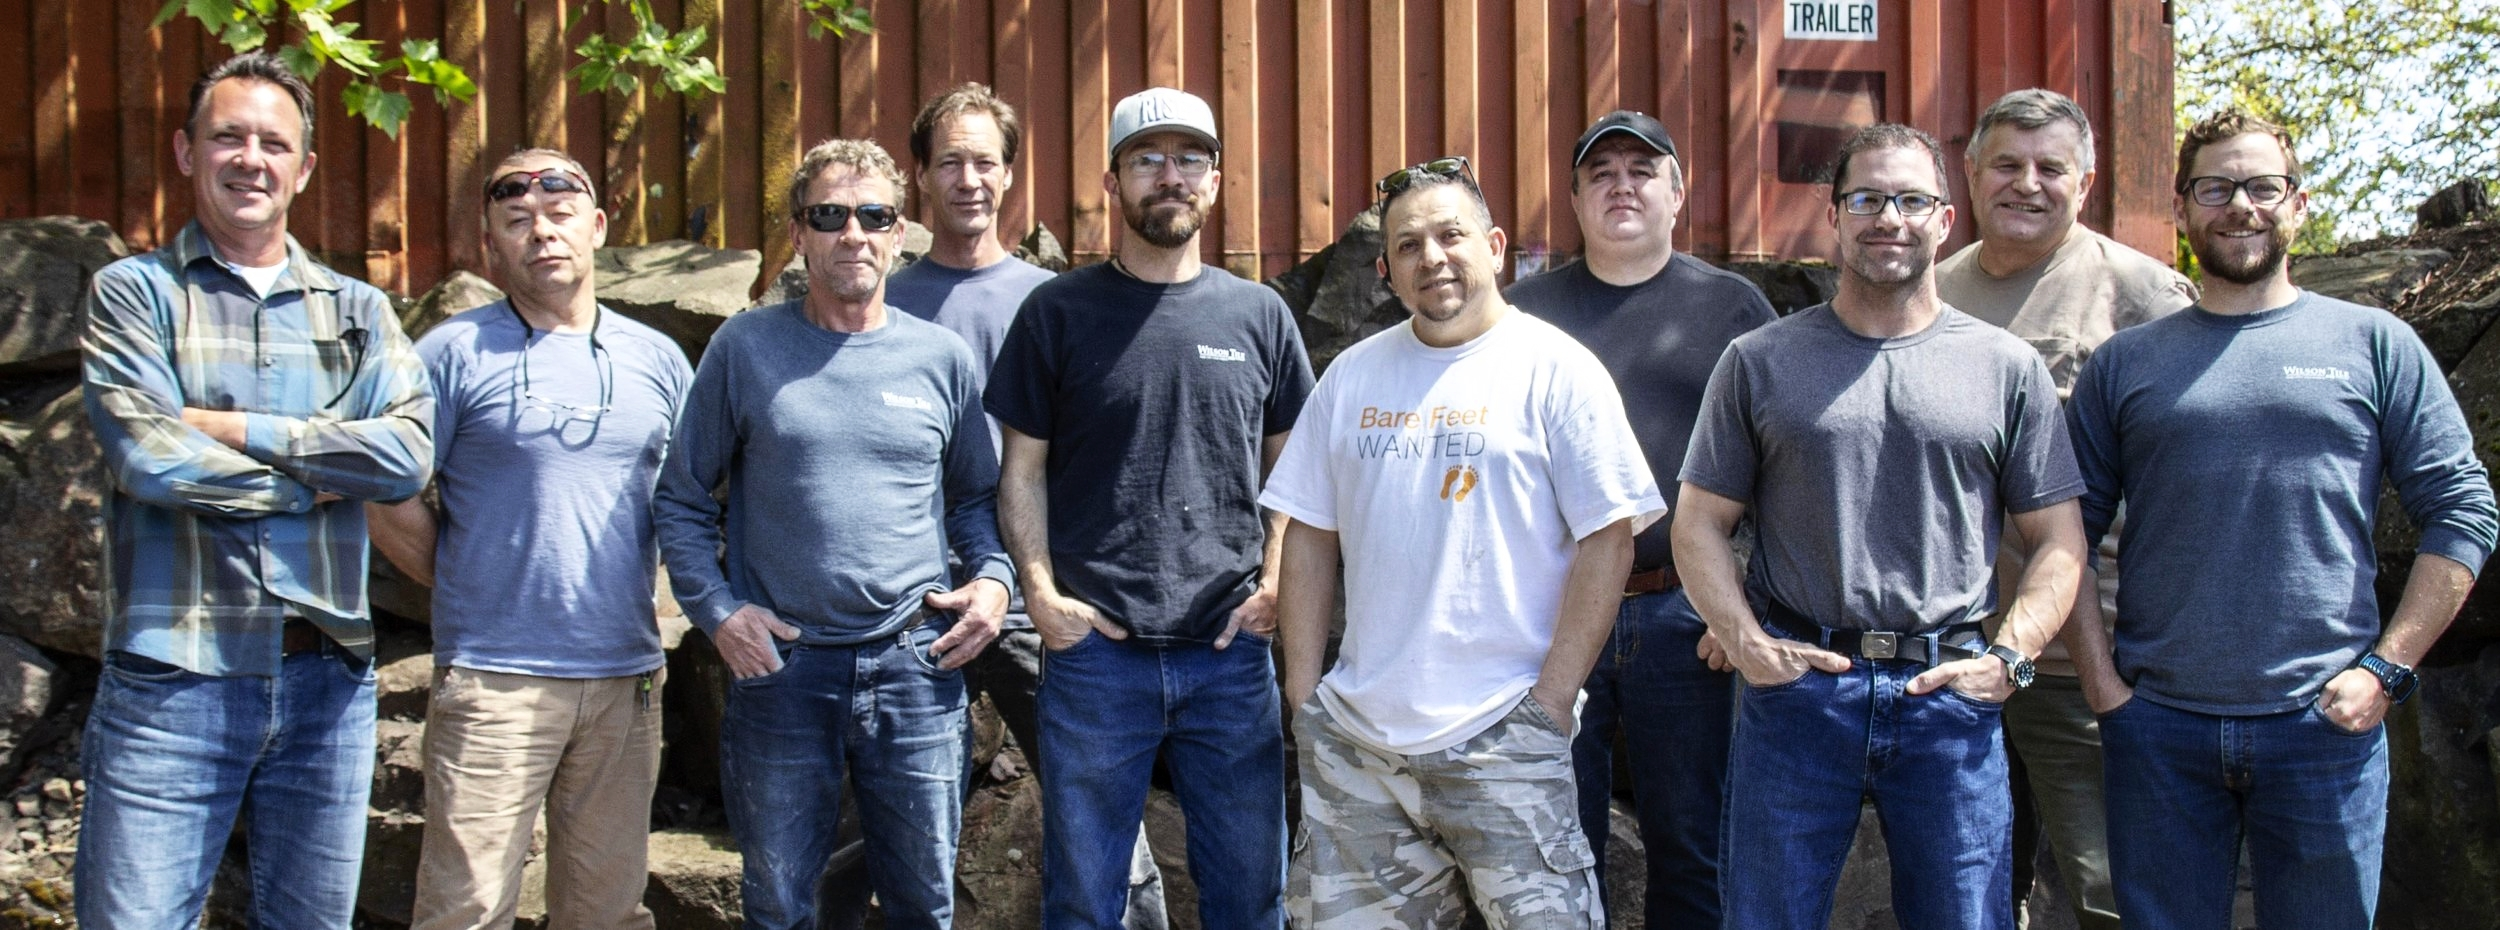 Crew Cropped.jpg